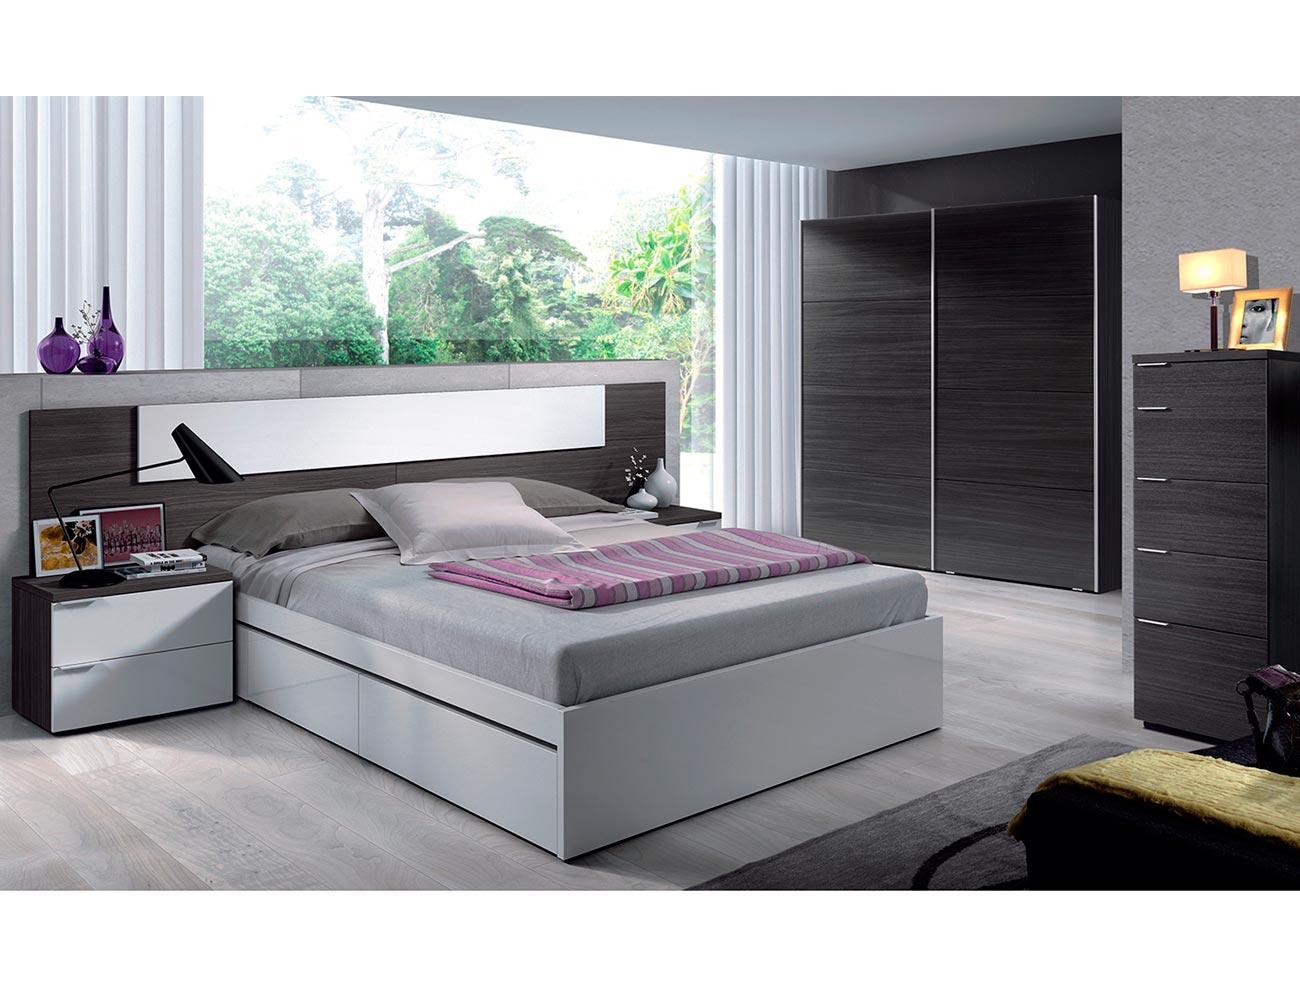 Dormitorio matrimonio moderno barato gris ceniza blanco 2